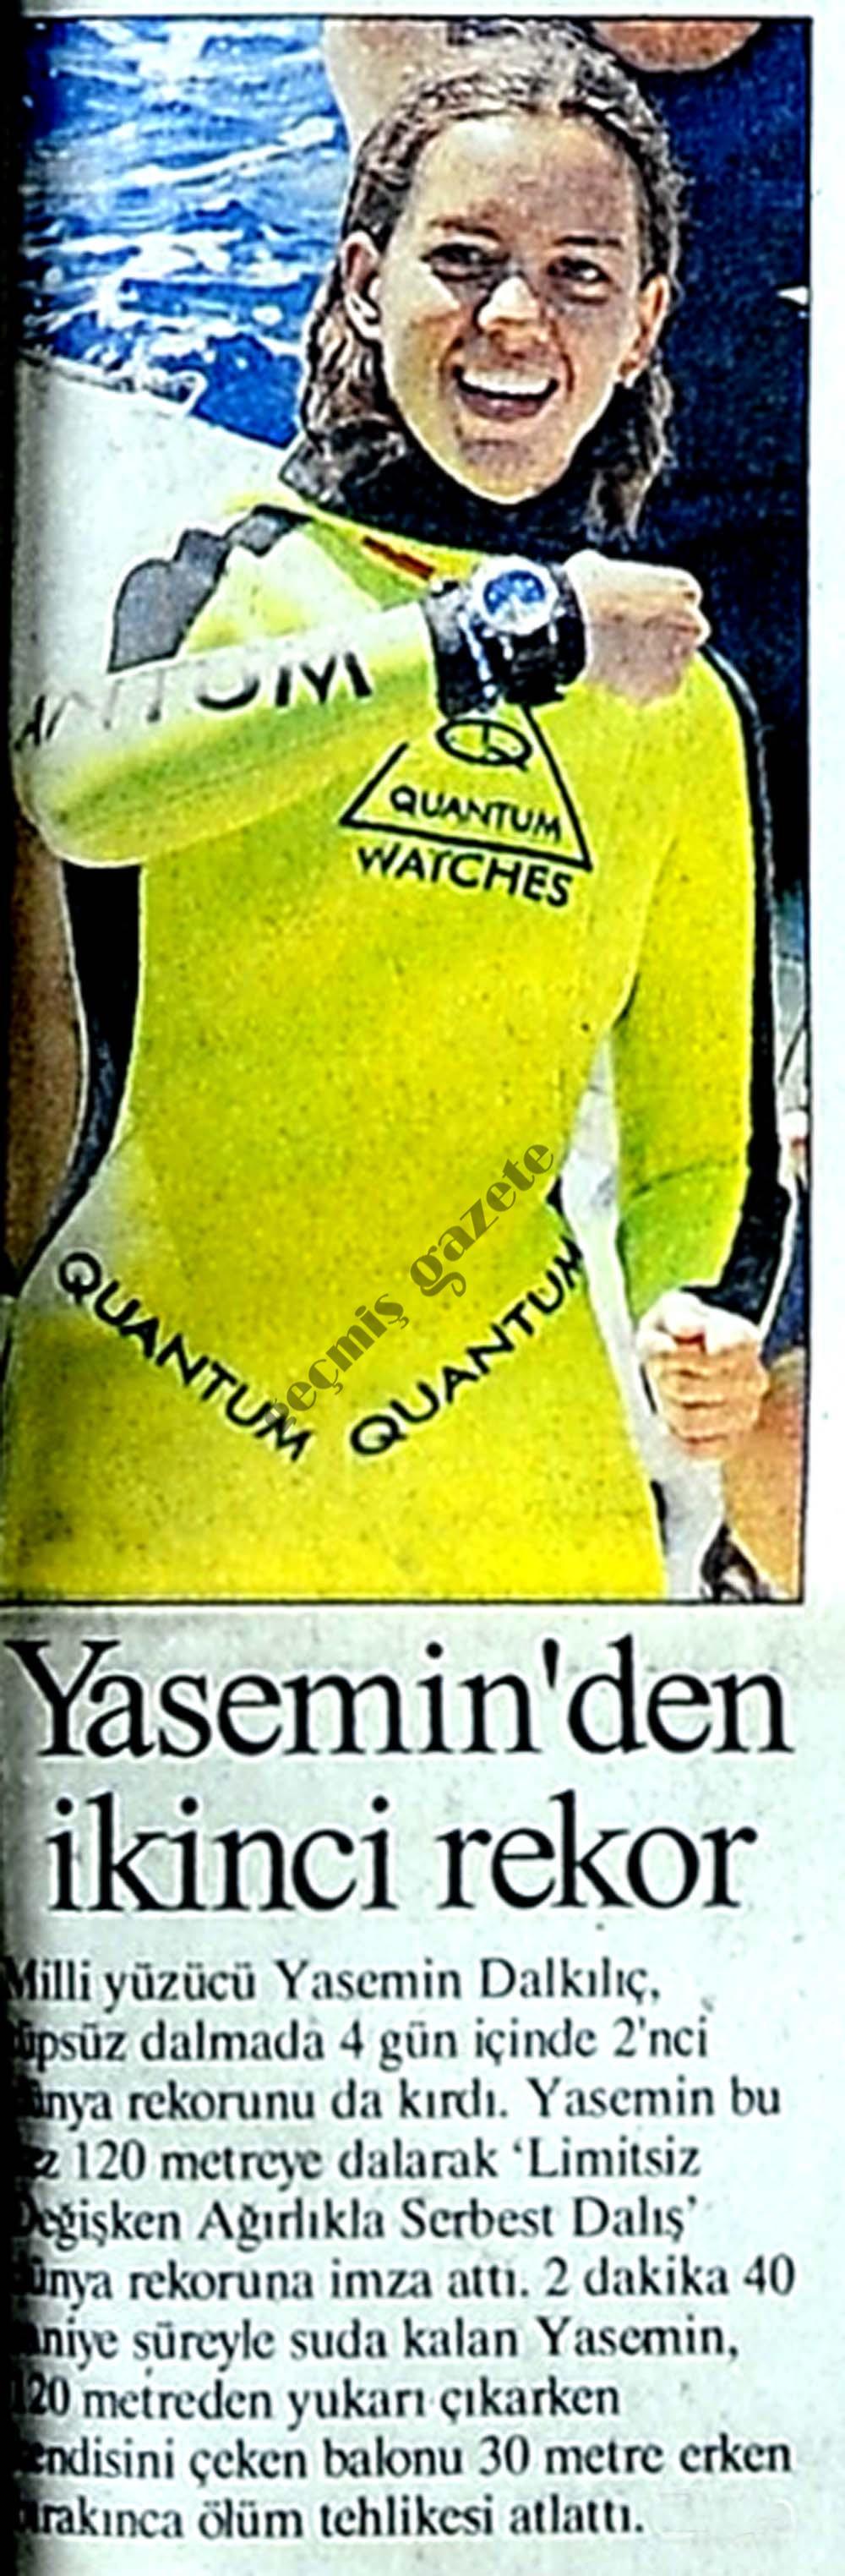 Yasemin'den ikinci rekor